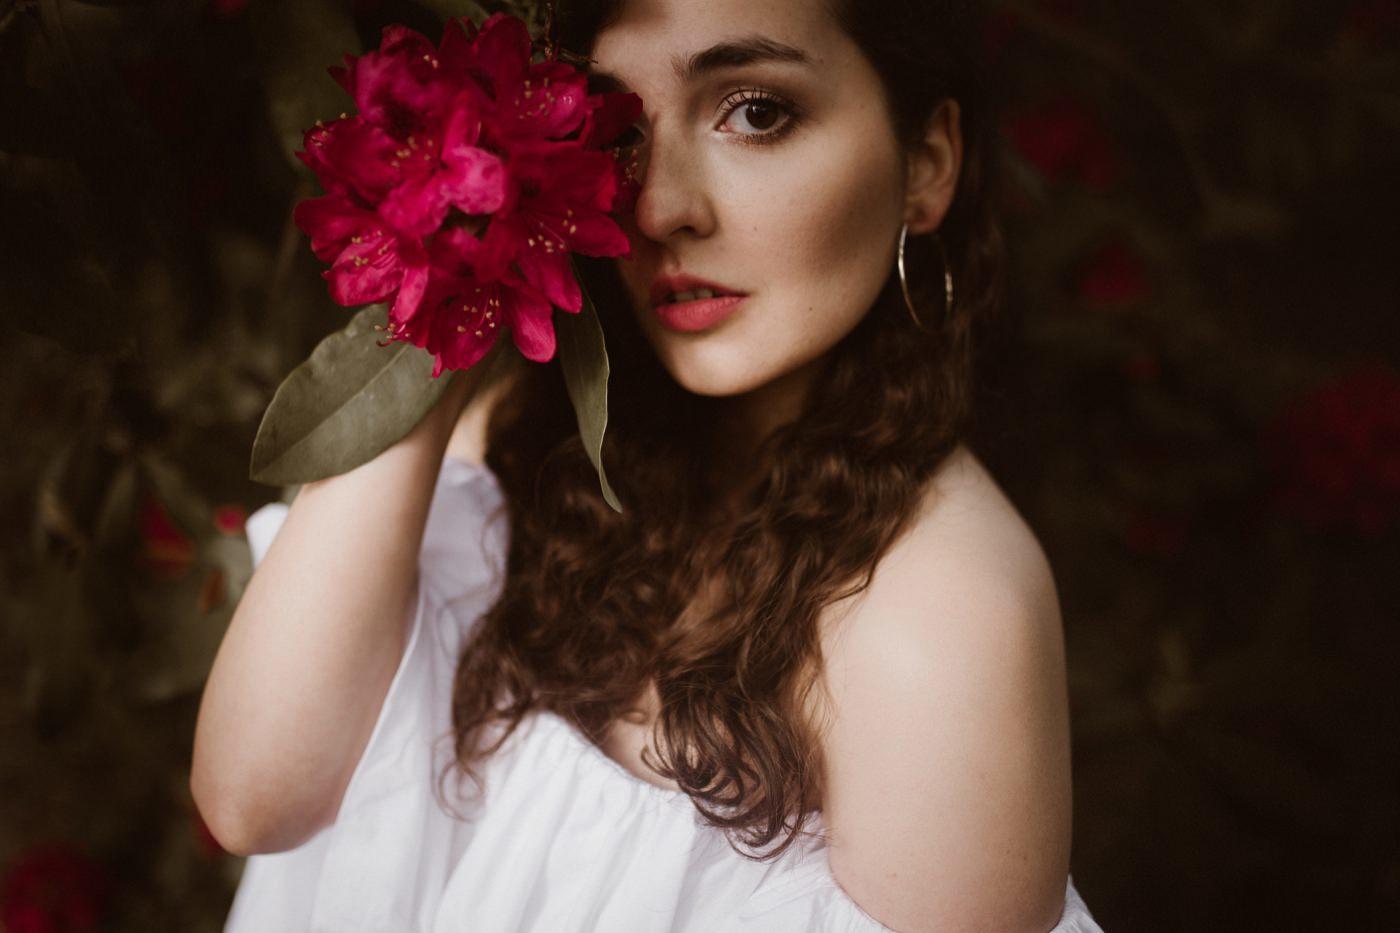 ewelina zieba sesja narzeczenska kwiaty warszawa 14